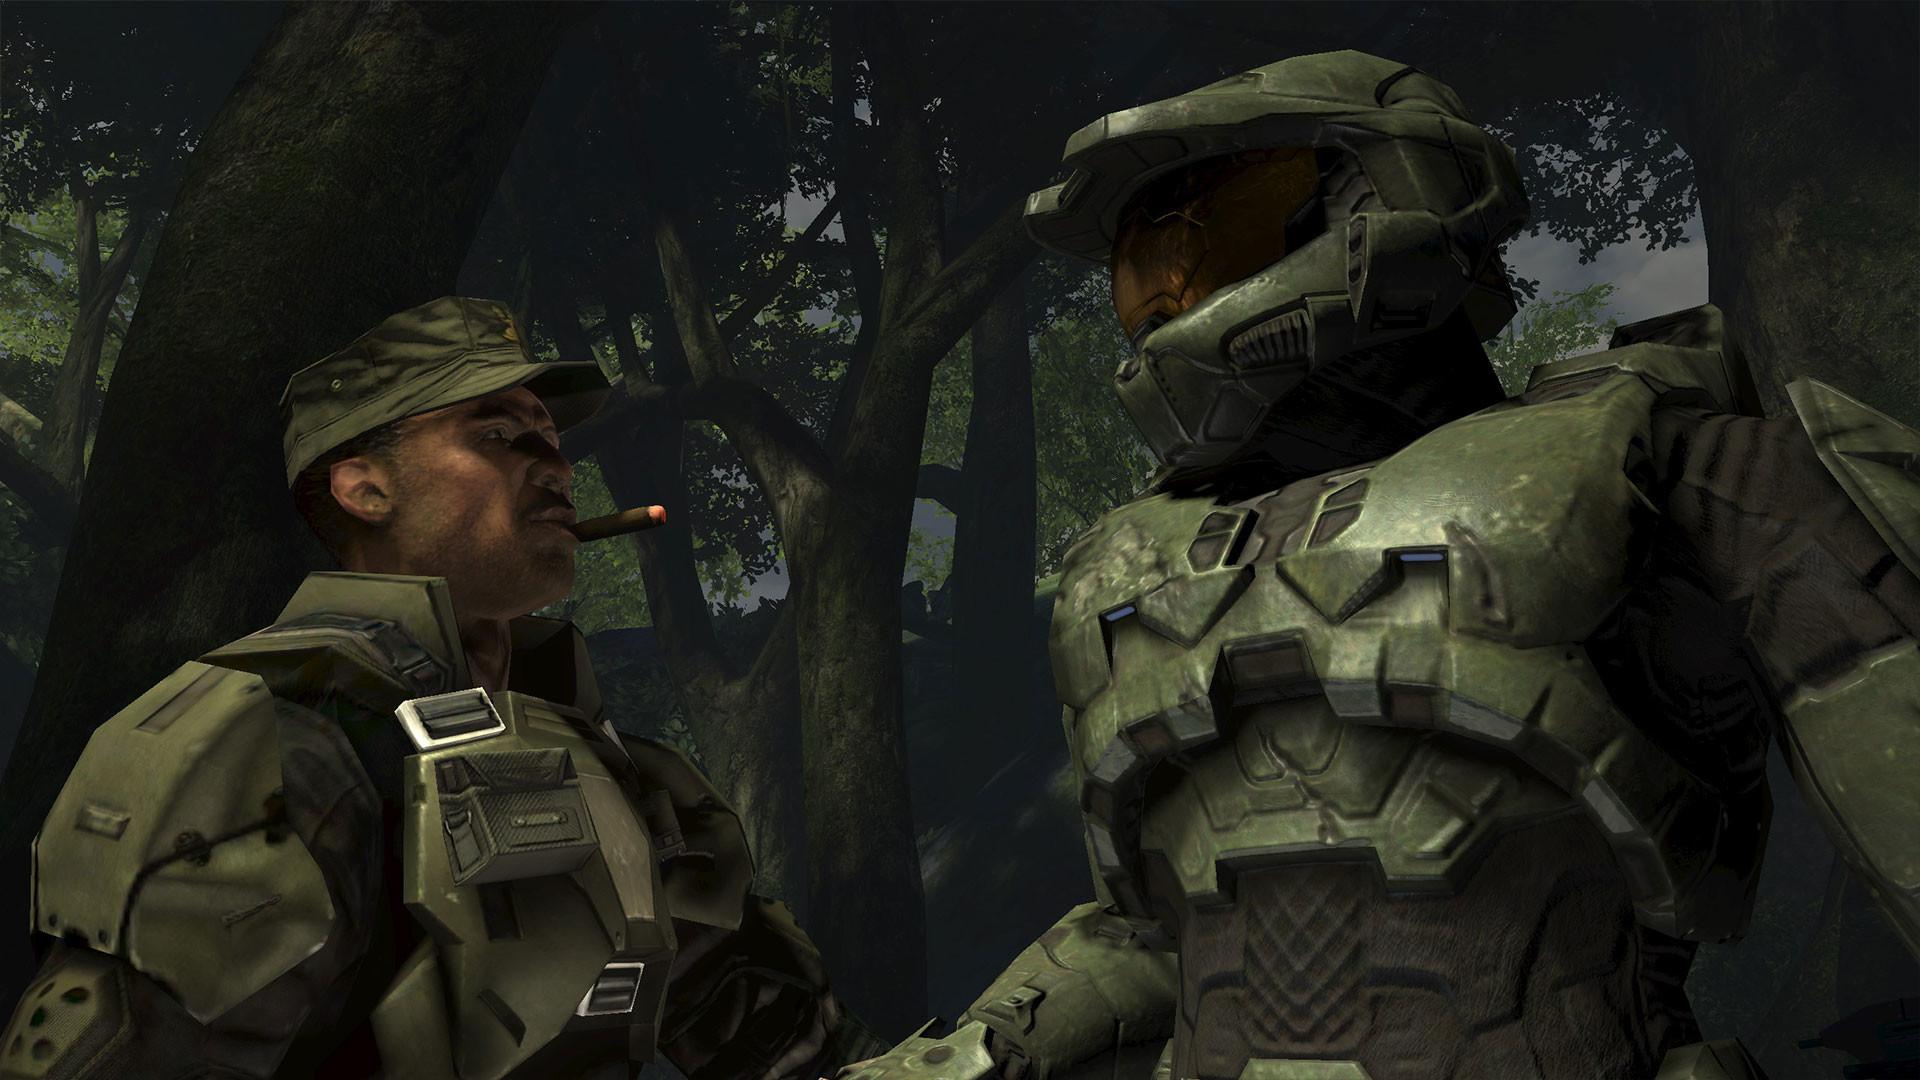 … Halo 3 Screenshot 3 …